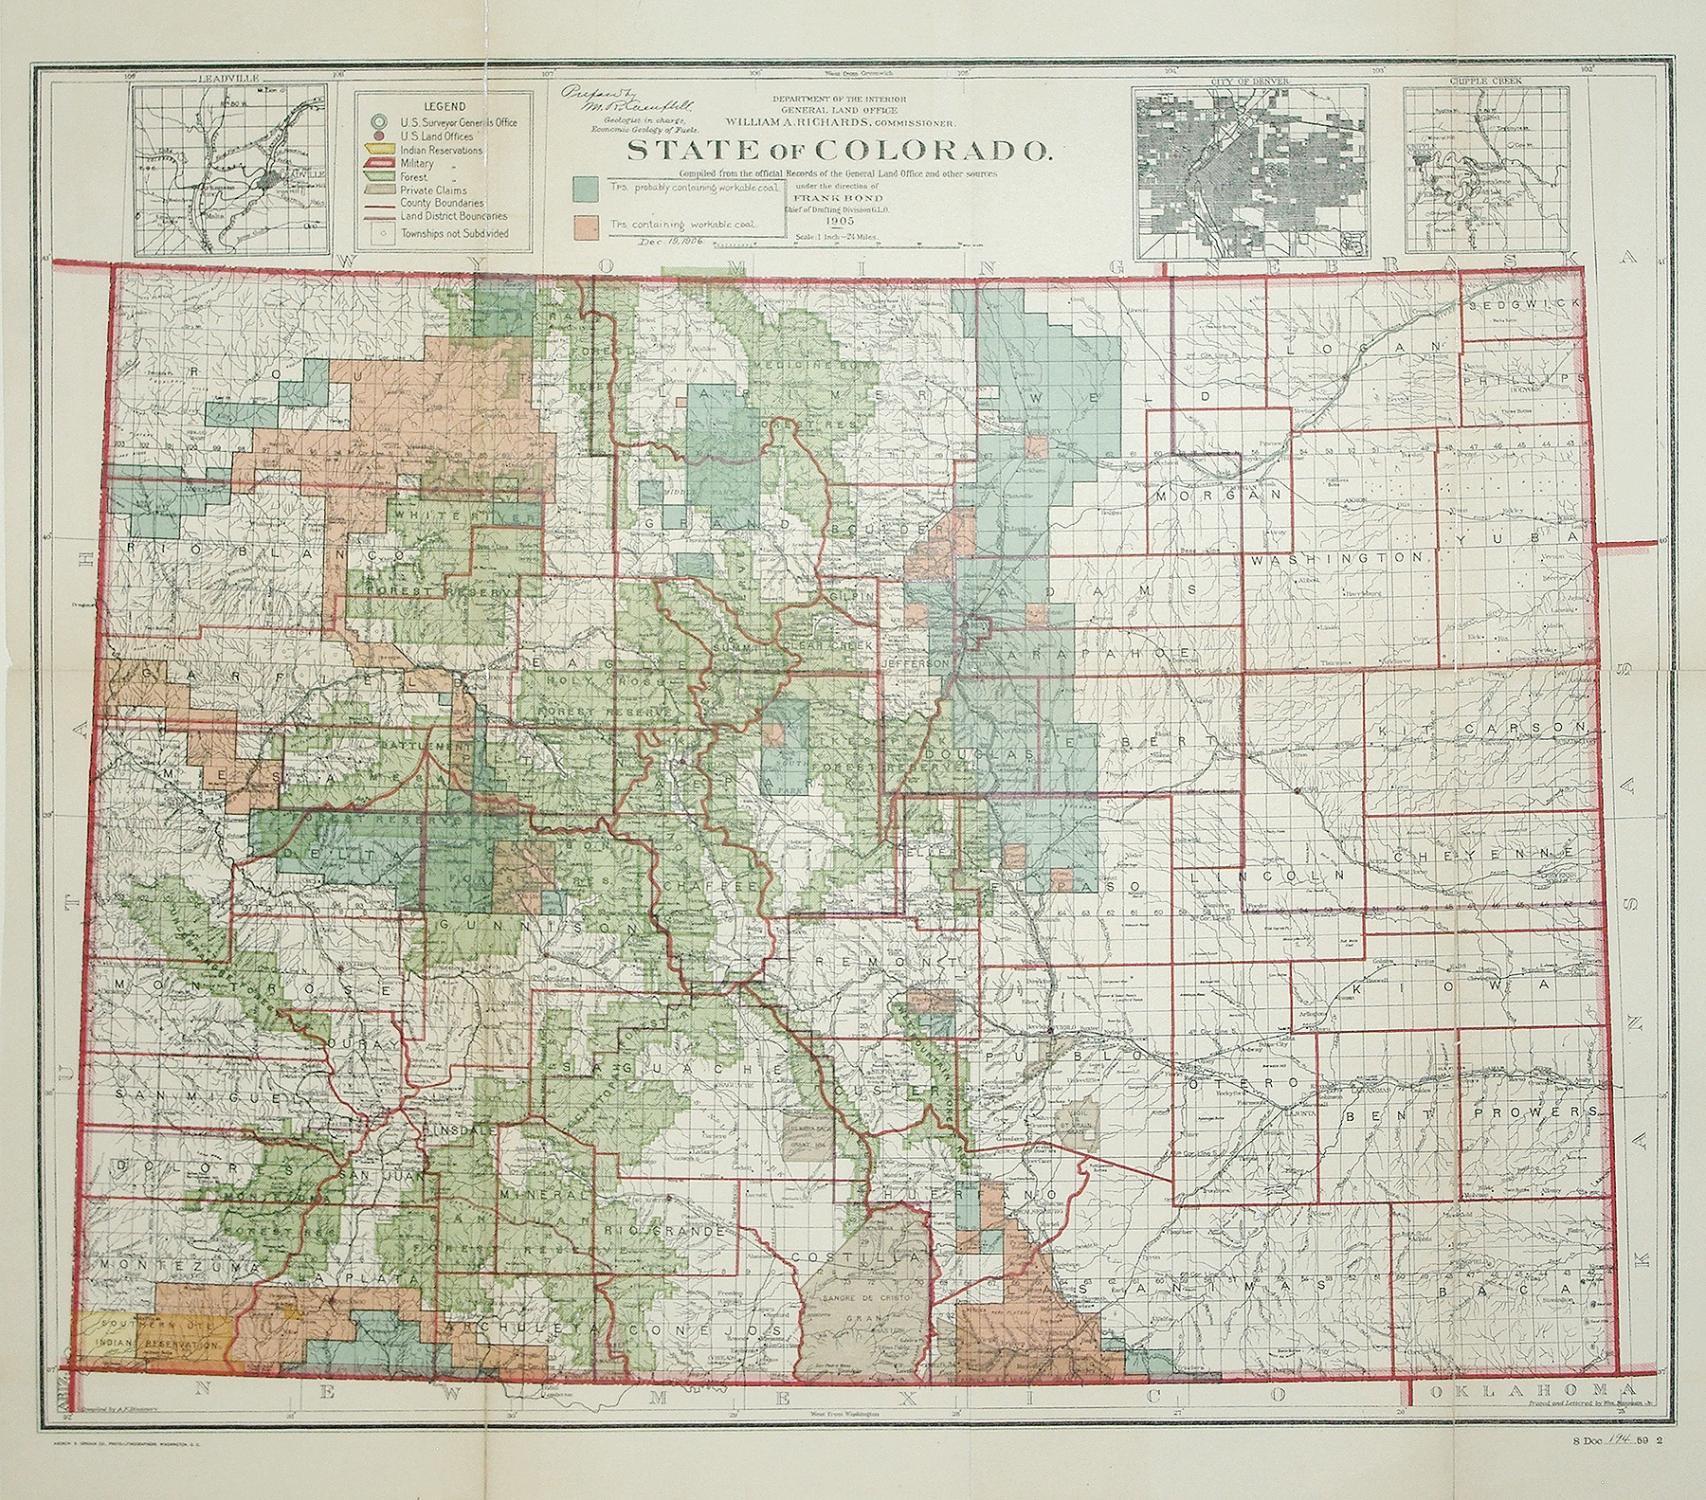 State of Colorado Map: Frank Bond